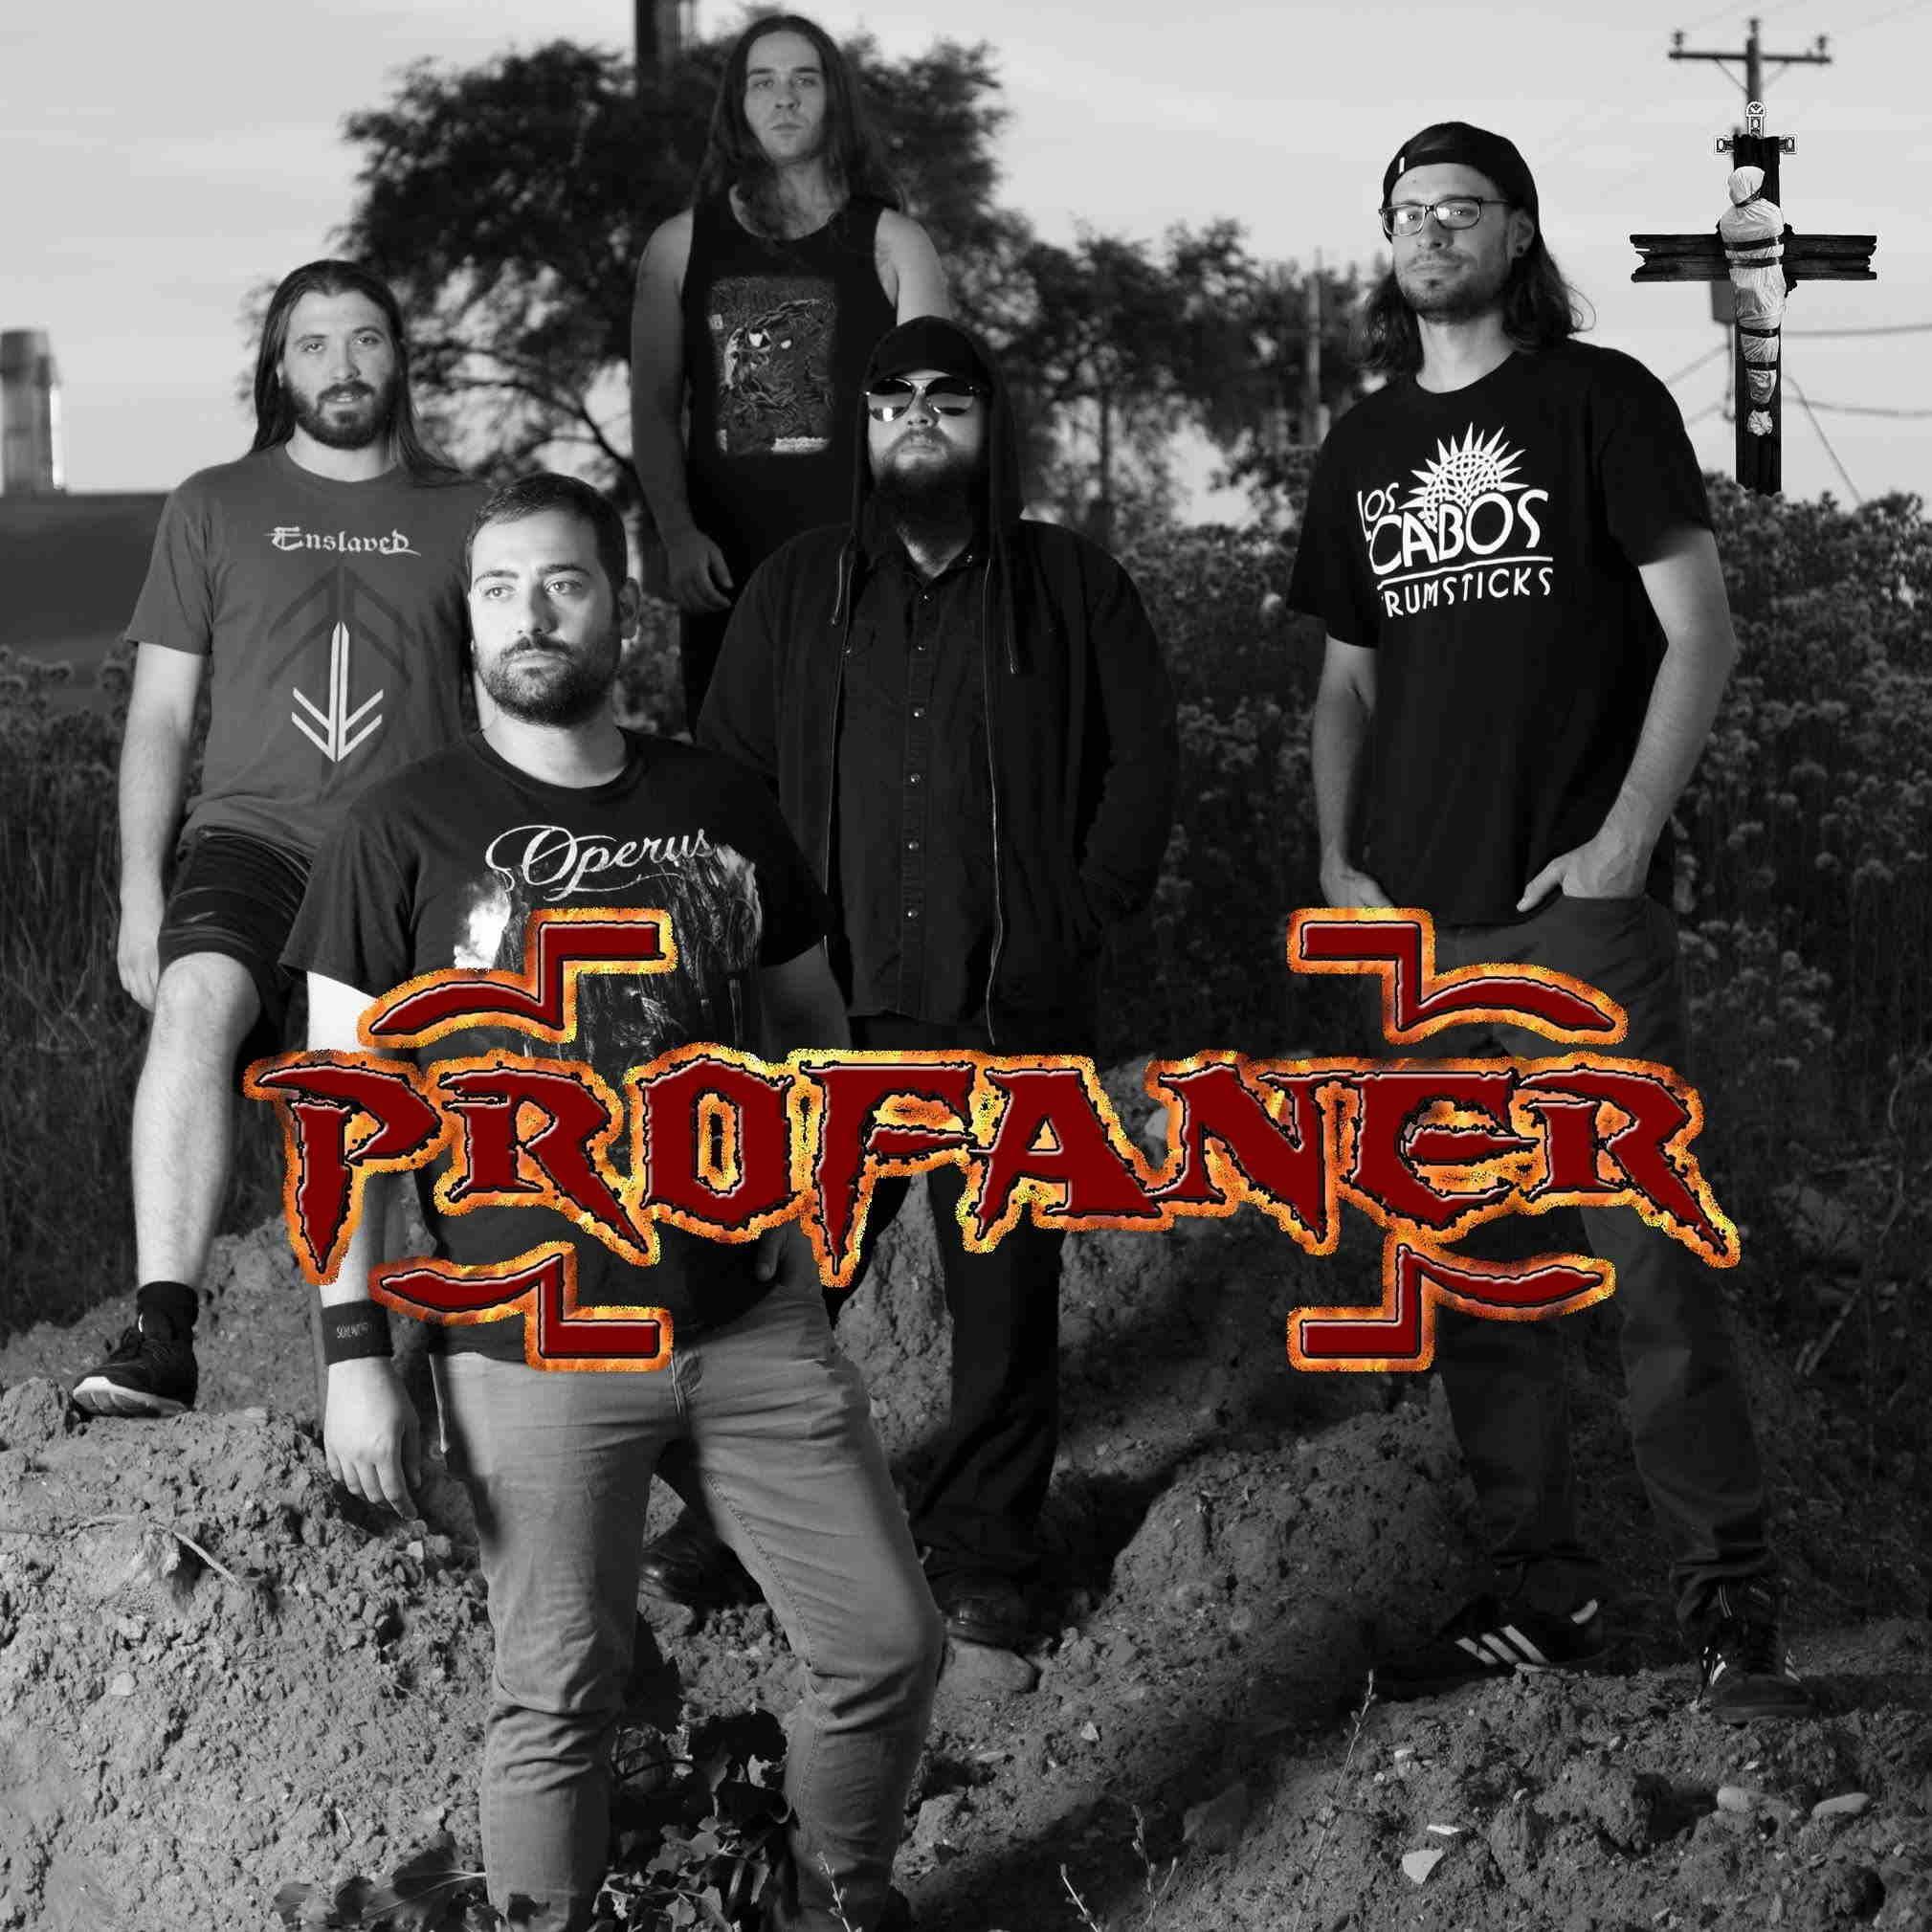 Profaner - Photo